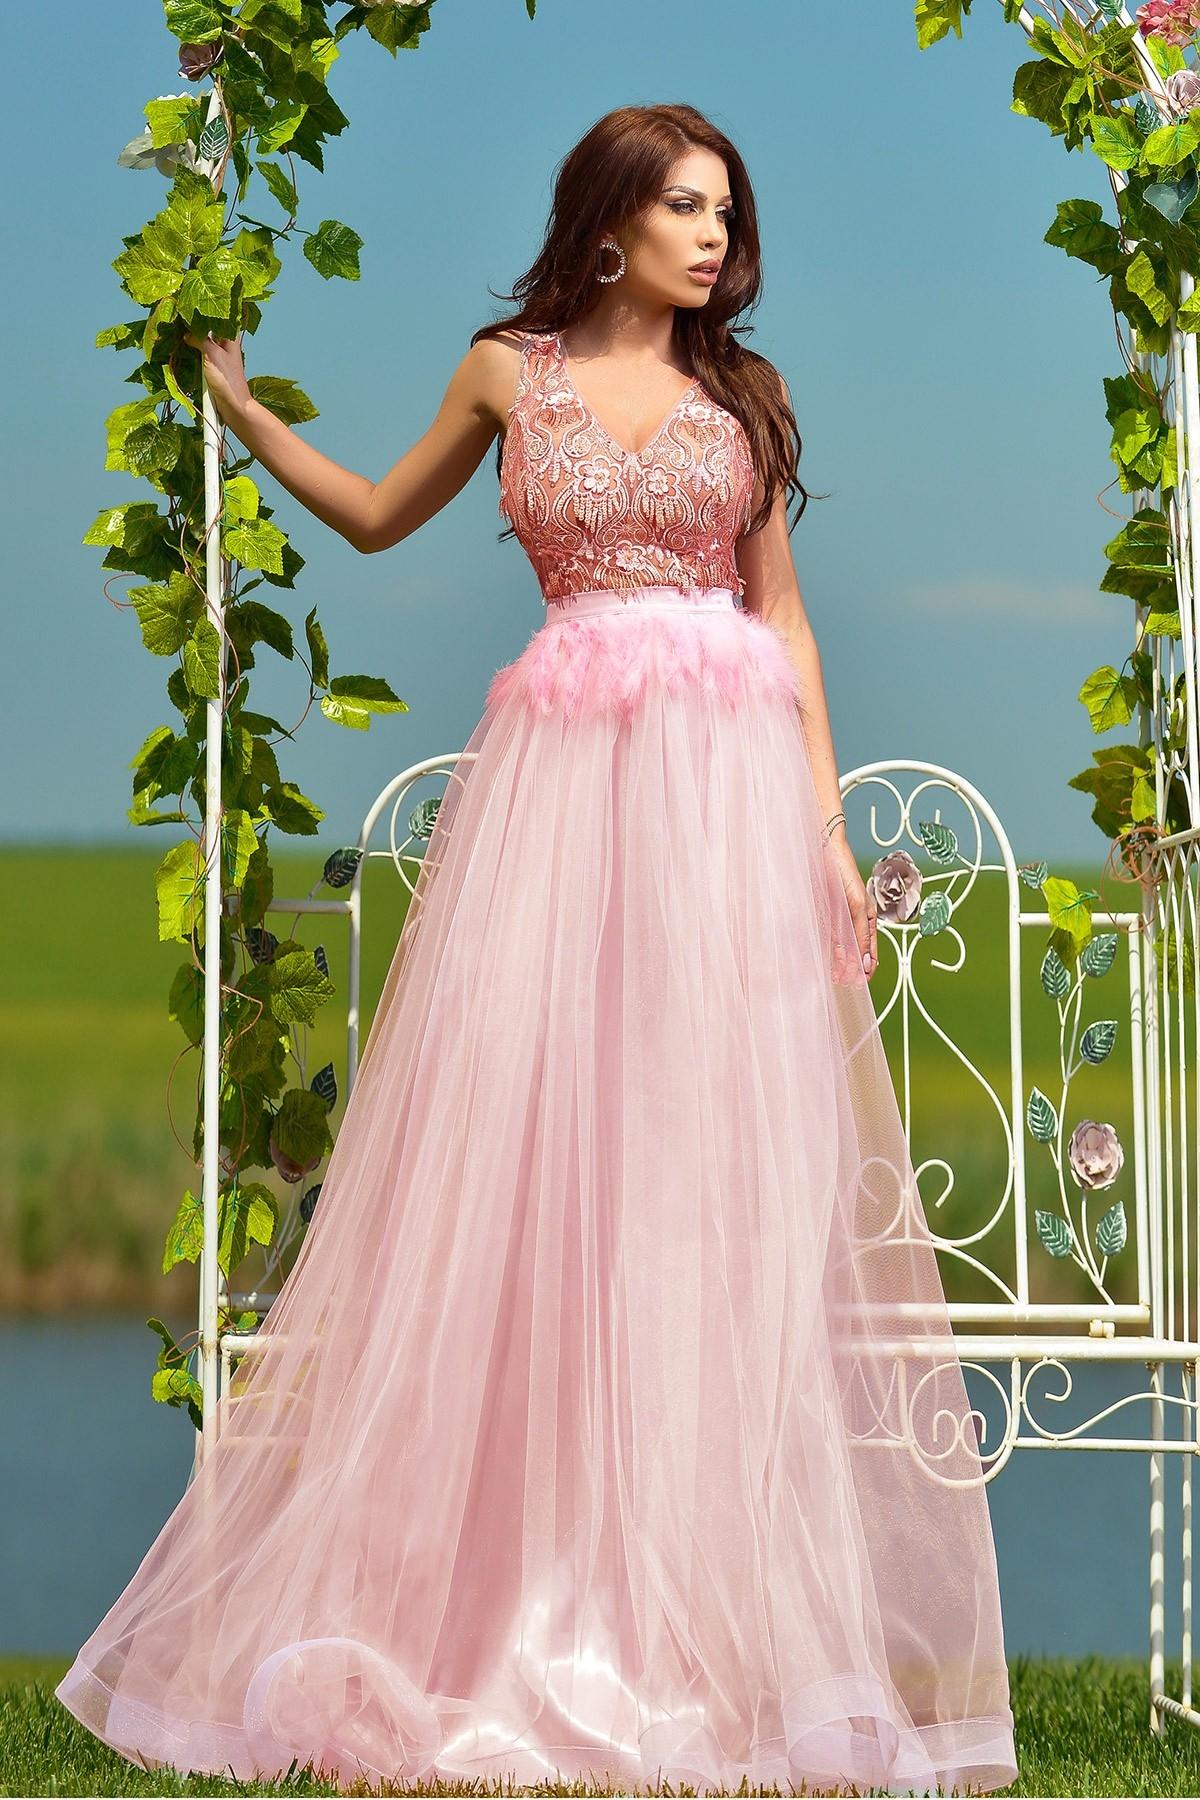 Rochie de lux rose Atmosphere din tull cu pene Atmosphere